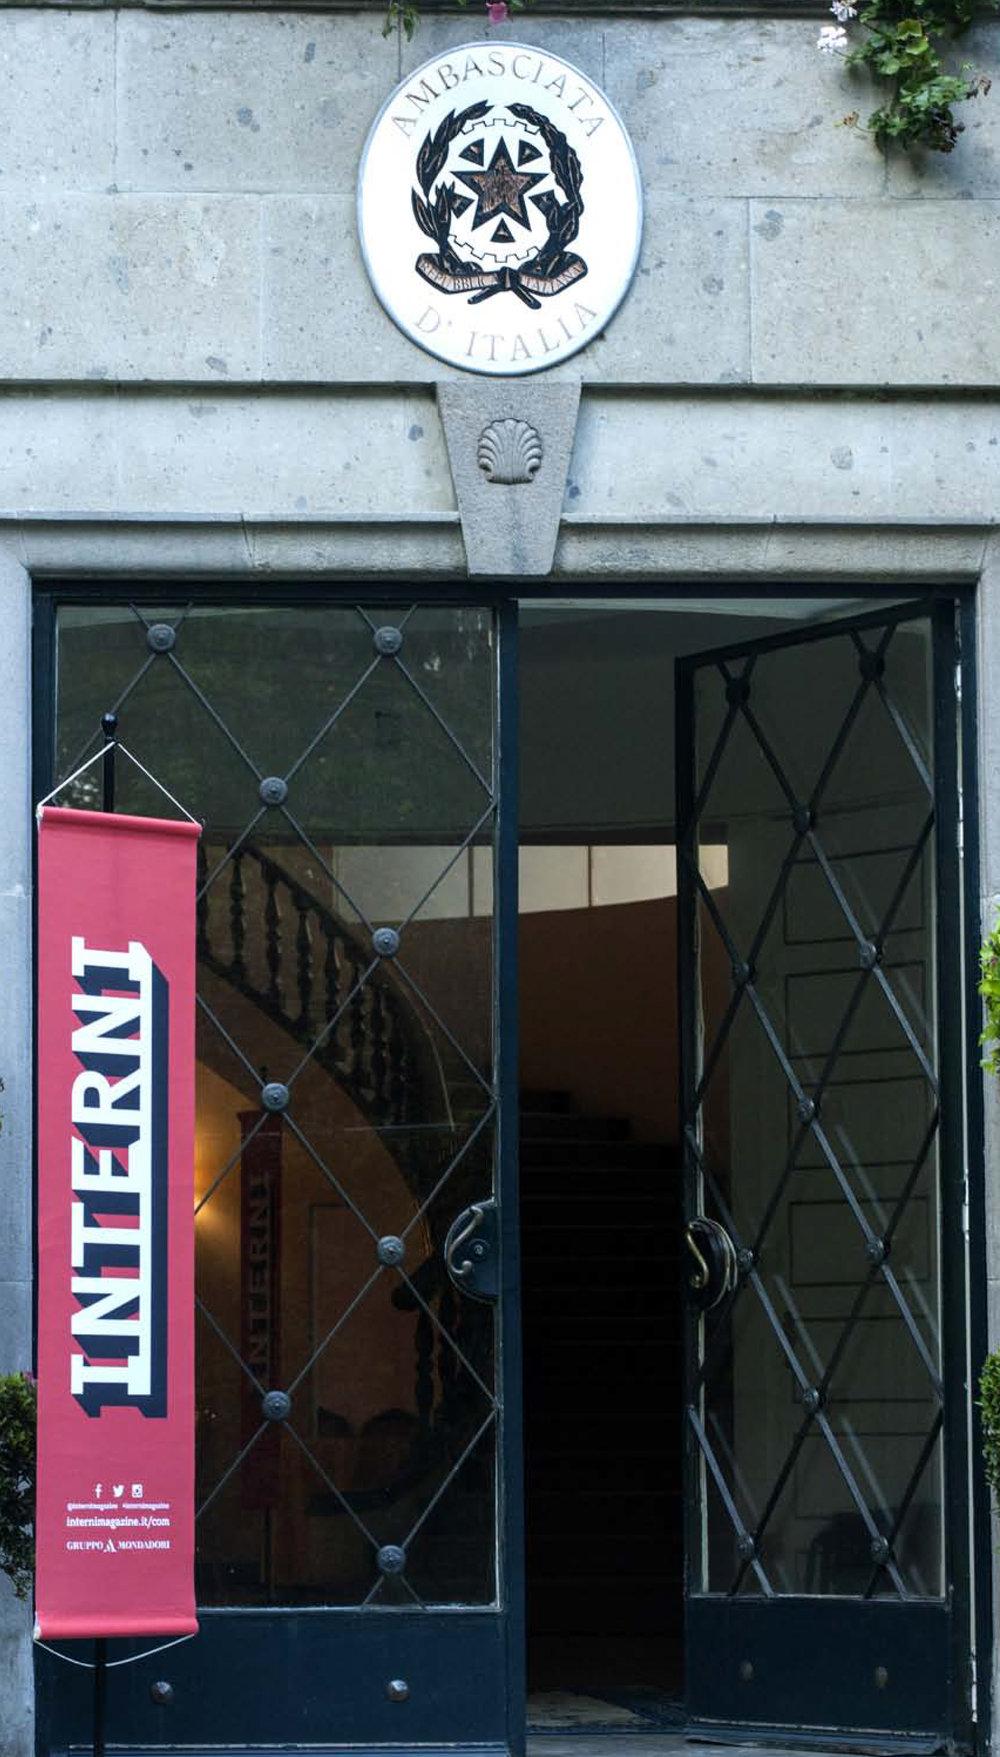 Evento de INTERNI en la Embajada de Italia en México.